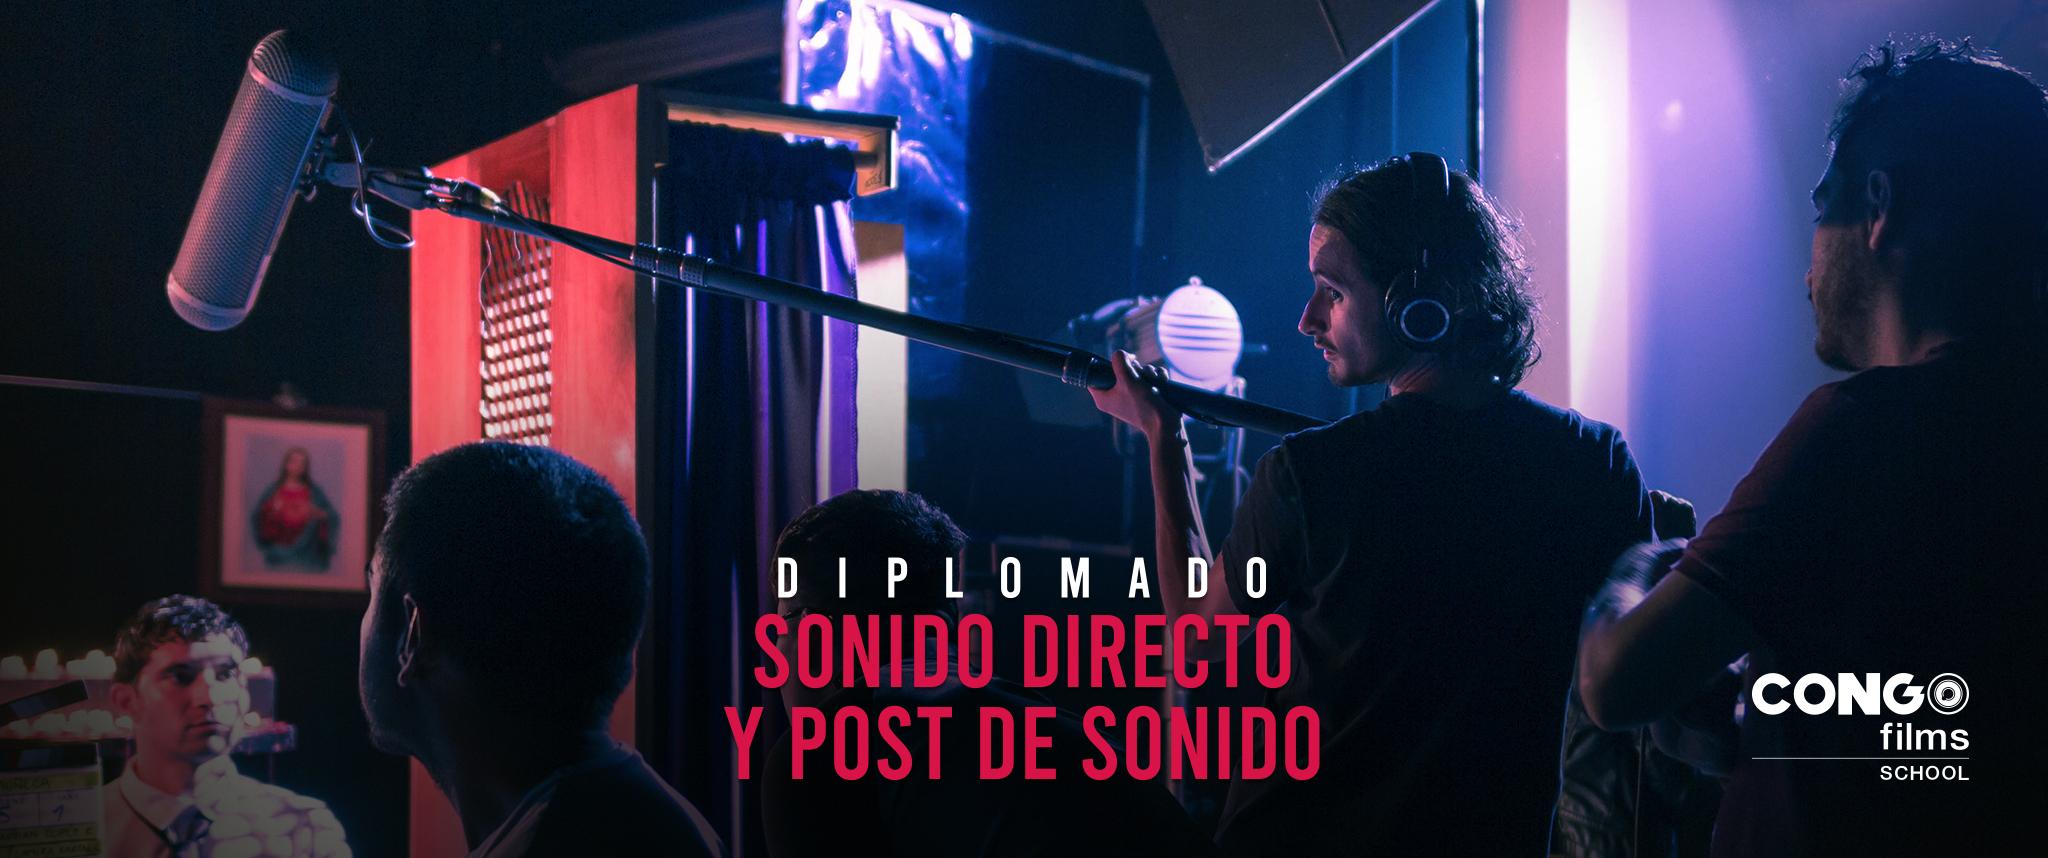 AF BANNER INTERNO WEB - DIPLOMADOS NOCTURNOS 2020 - MONTAJE Y COLOR V2 cuarentena.jpg